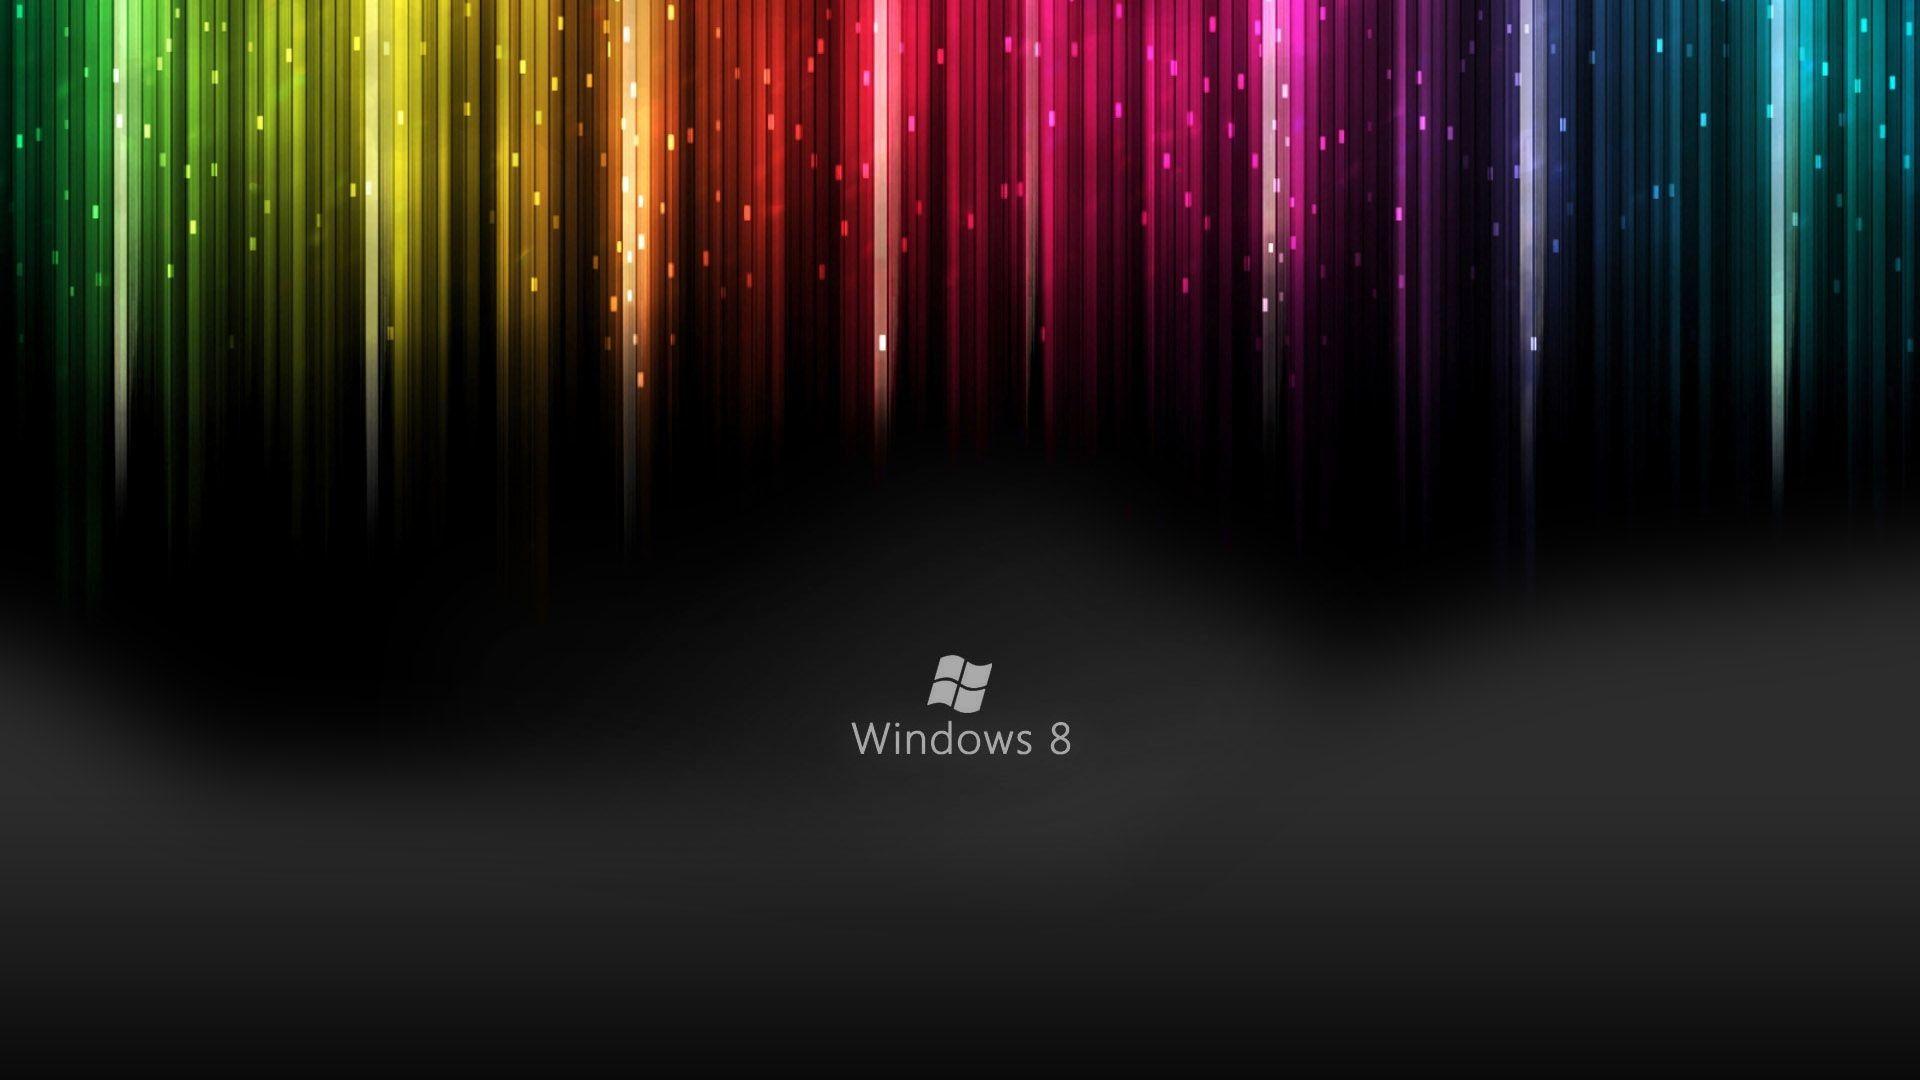 1920x1080 6 Live Wallpapers For Desktop7 600x338 Windows Wallpaper Live Wallpapers Hd Wallpaper Desktop